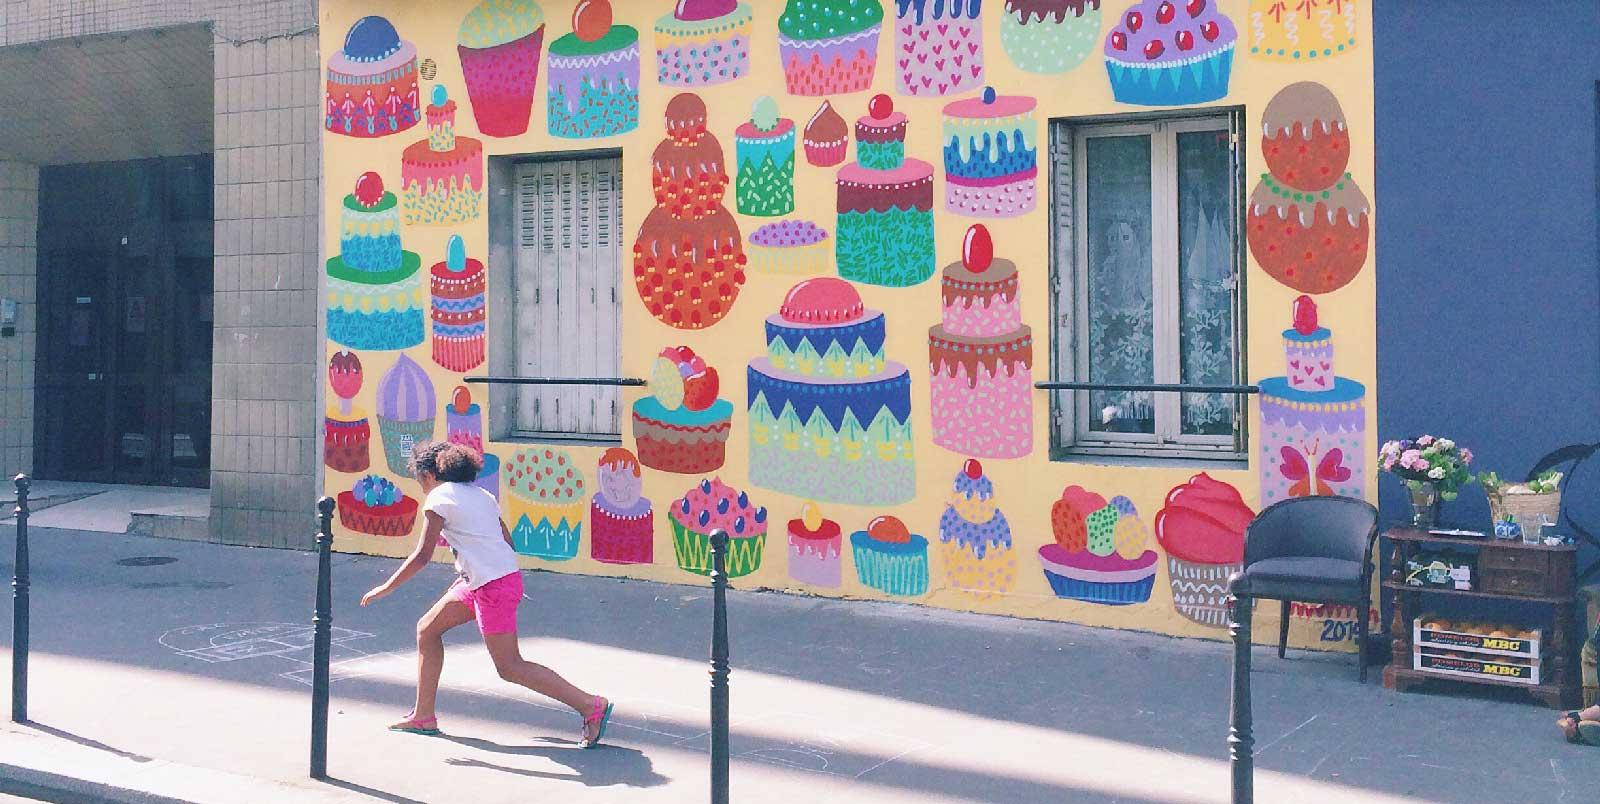 kashink gateaux street art